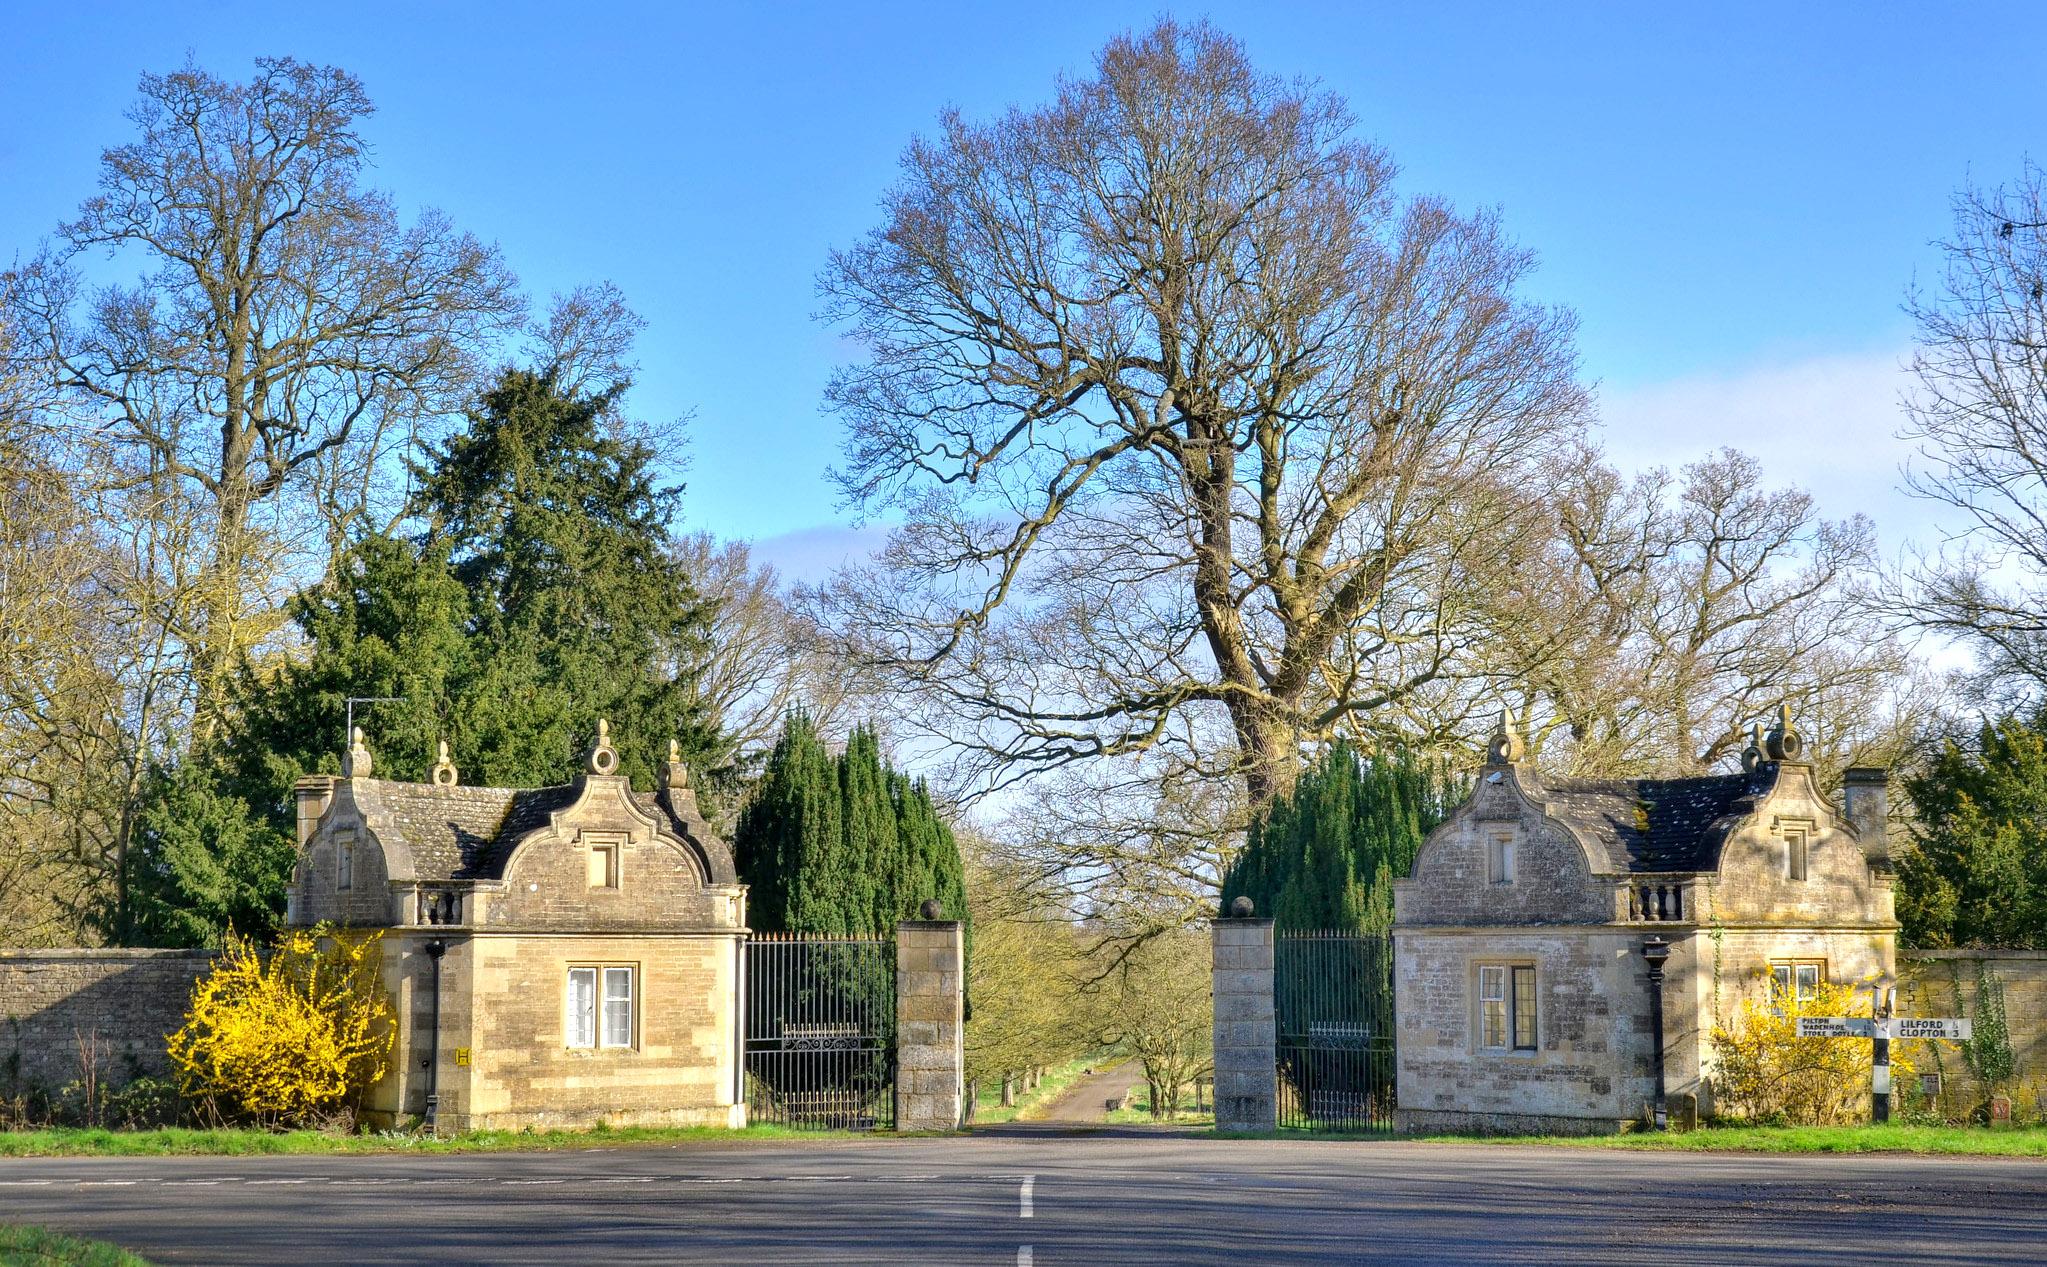 Entrance lodges, Lilford Park, Northants by Baz Richardson.jpg